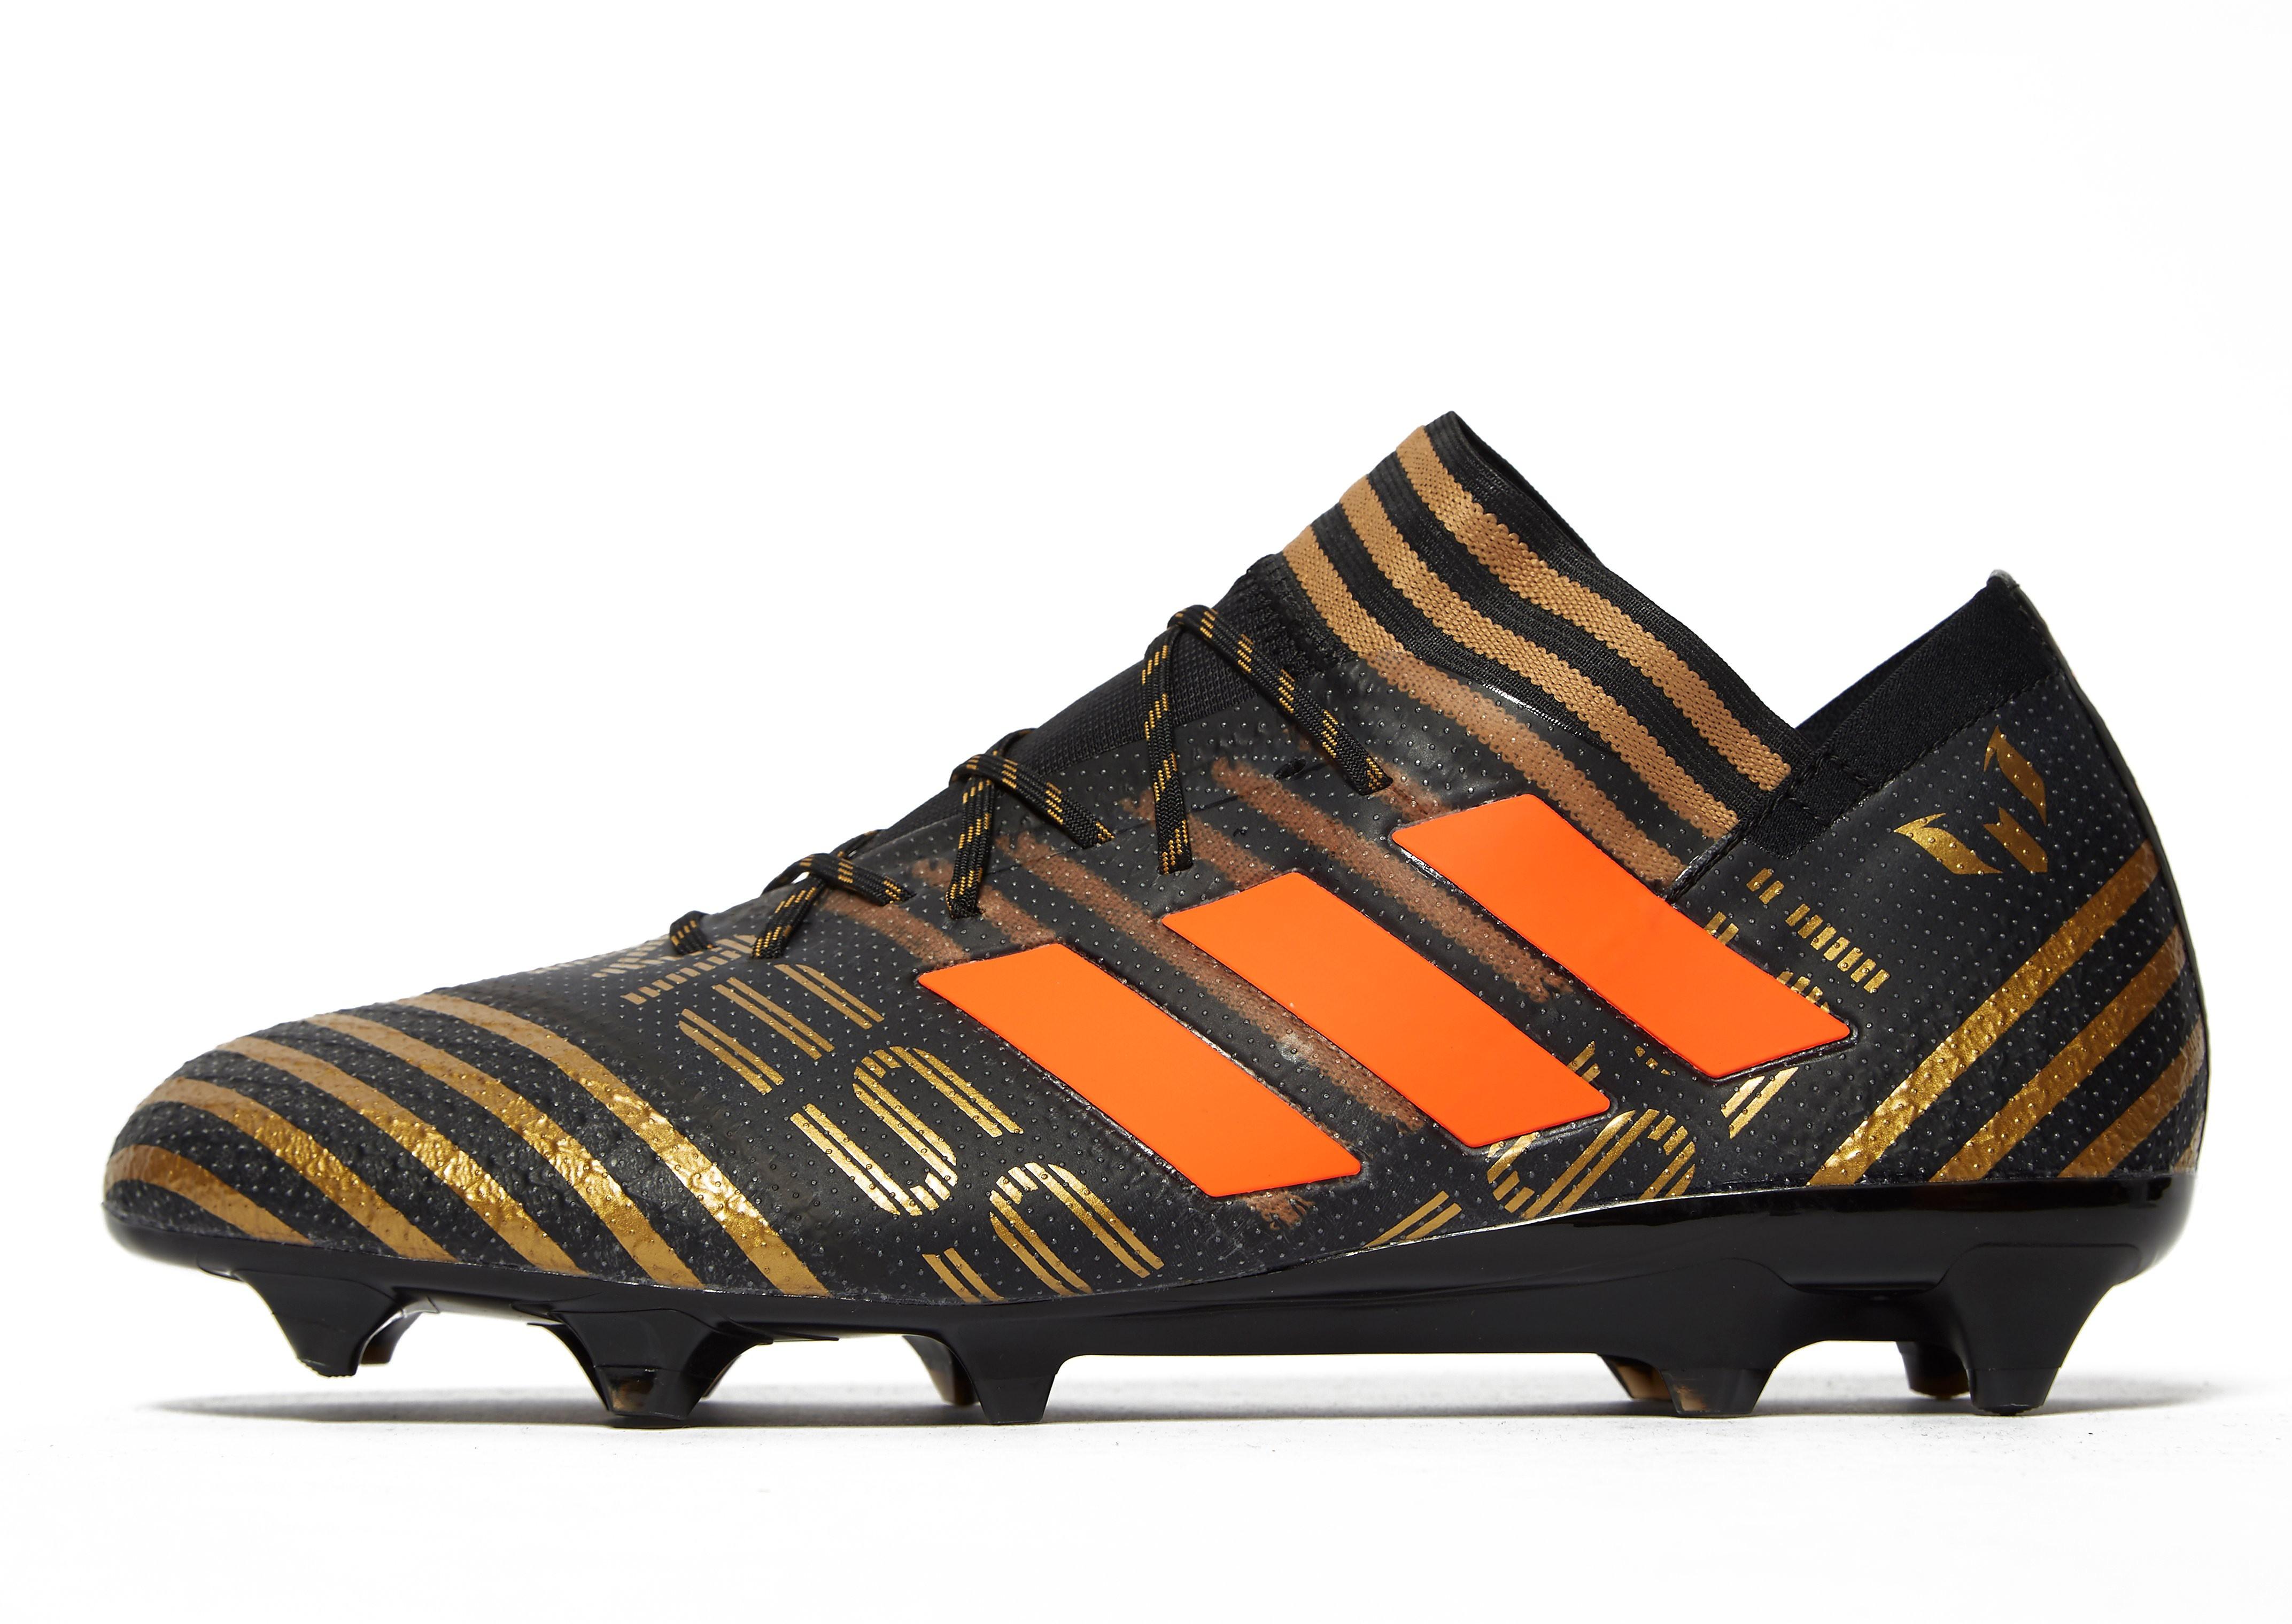 adidas SkyStalker Nemeziz Messi 17.1 FG